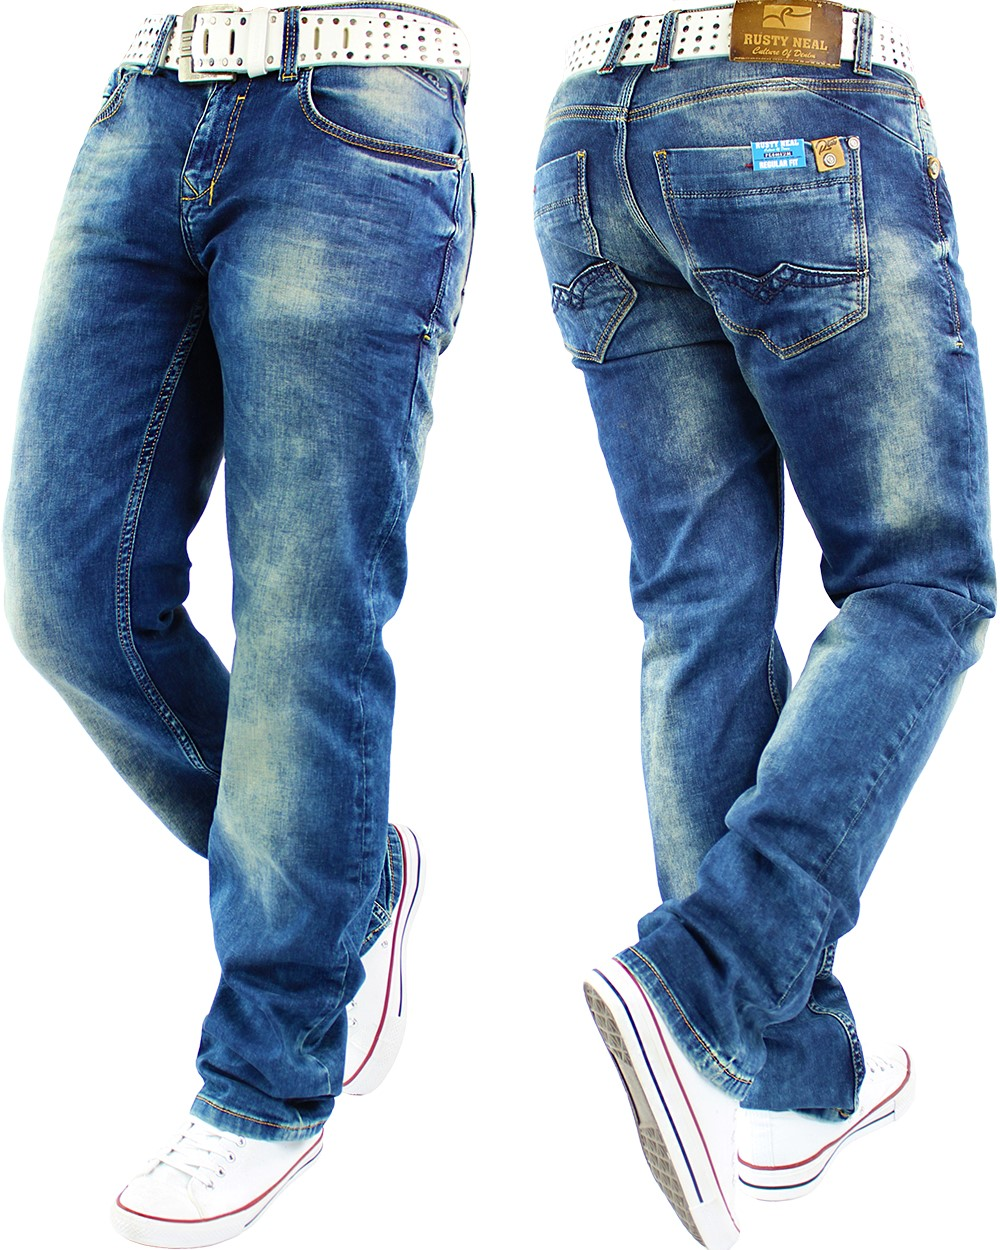 rusty r neal herren jeans star hose freizeithose mens. Black Bedroom Furniture Sets. Home Design Ideas